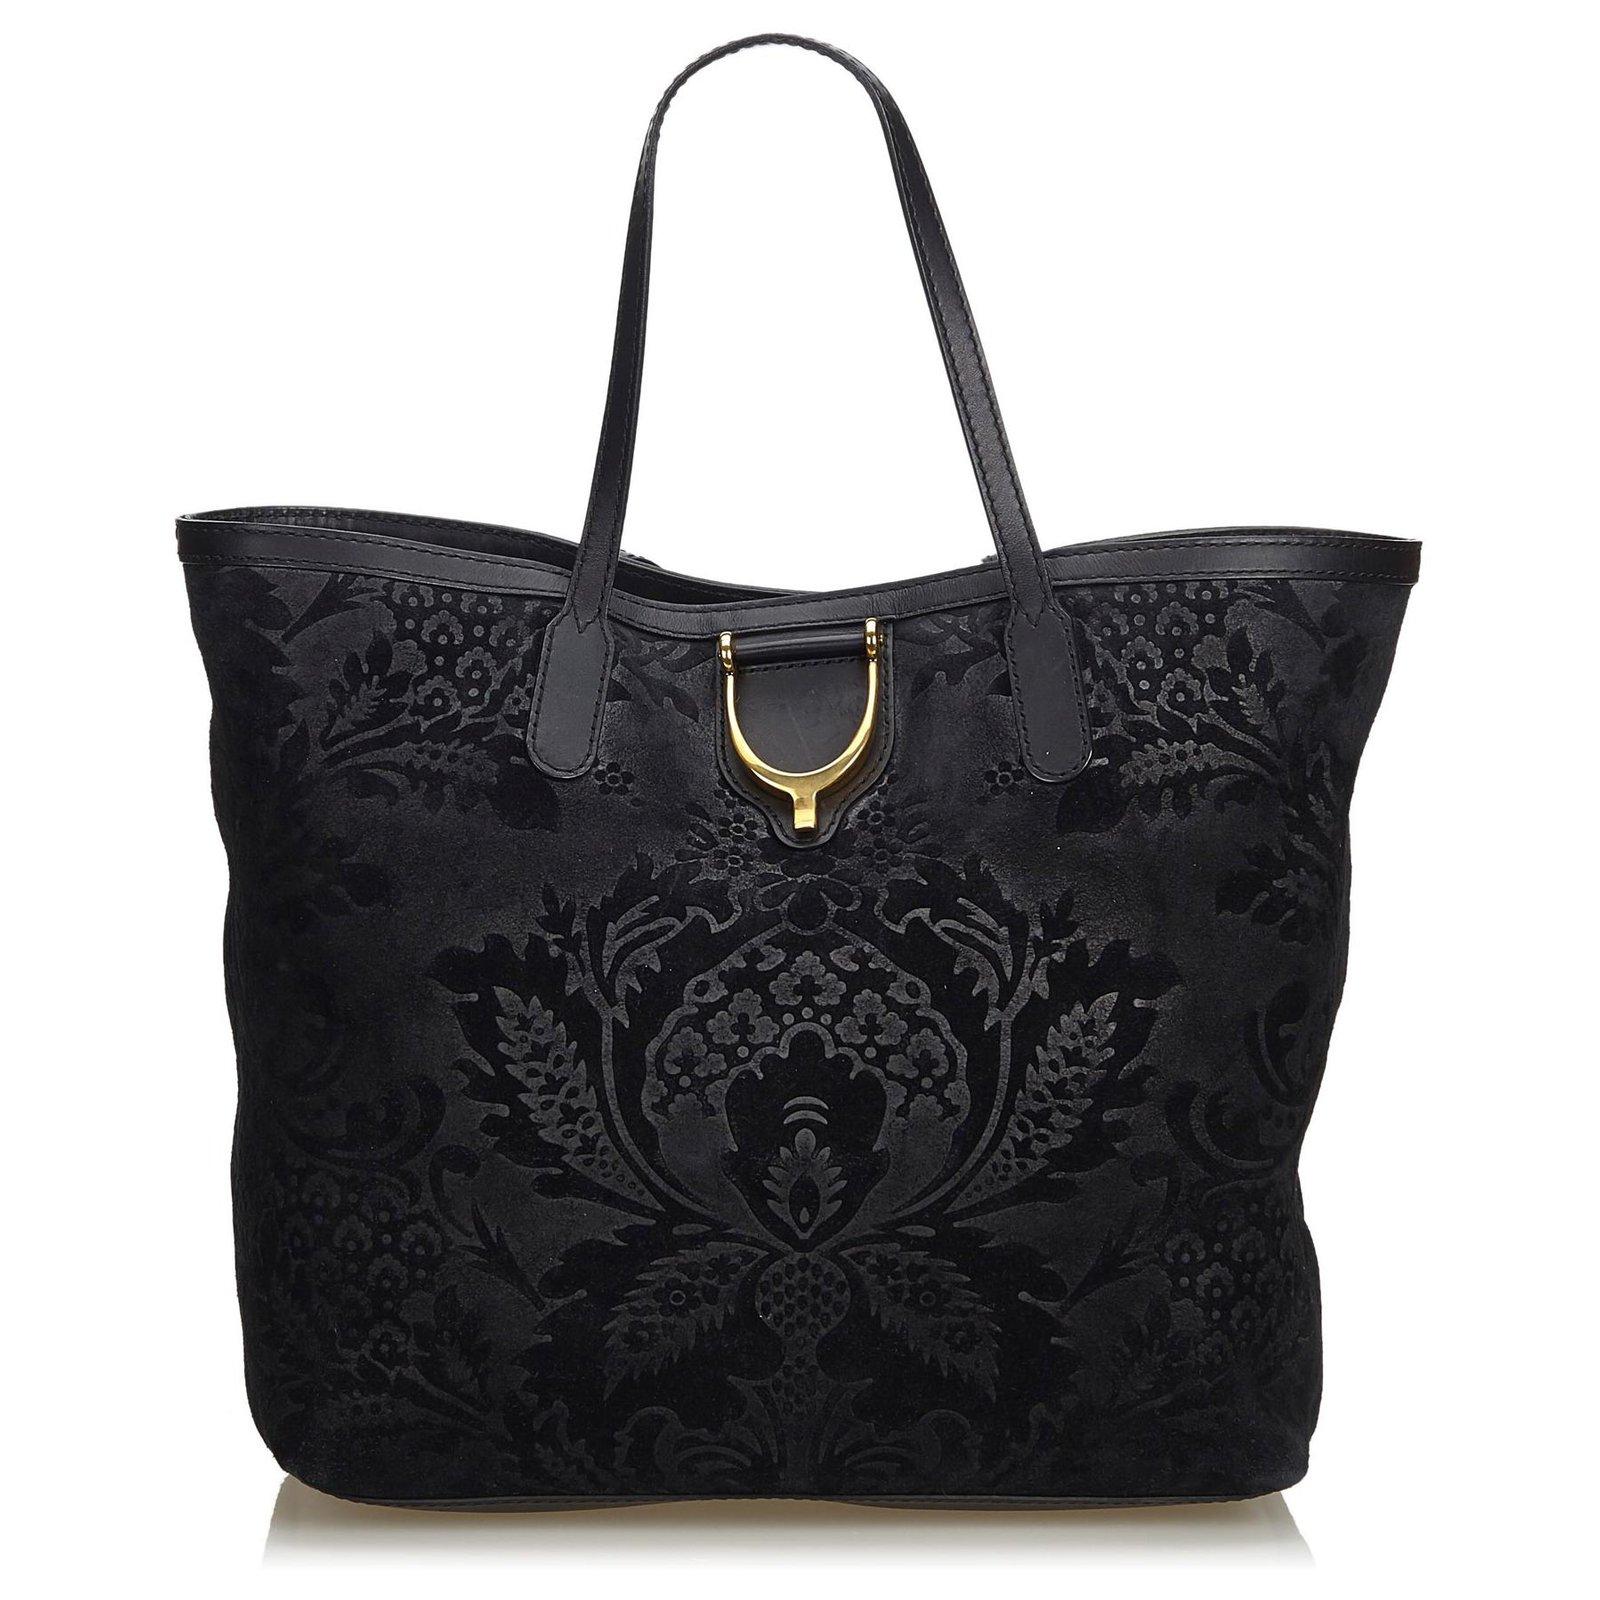 ac5218f54 Gucci Gucci Black Suede Brocade Stirrup Tote Bag Totes Suede,Leather Black  ref.122883